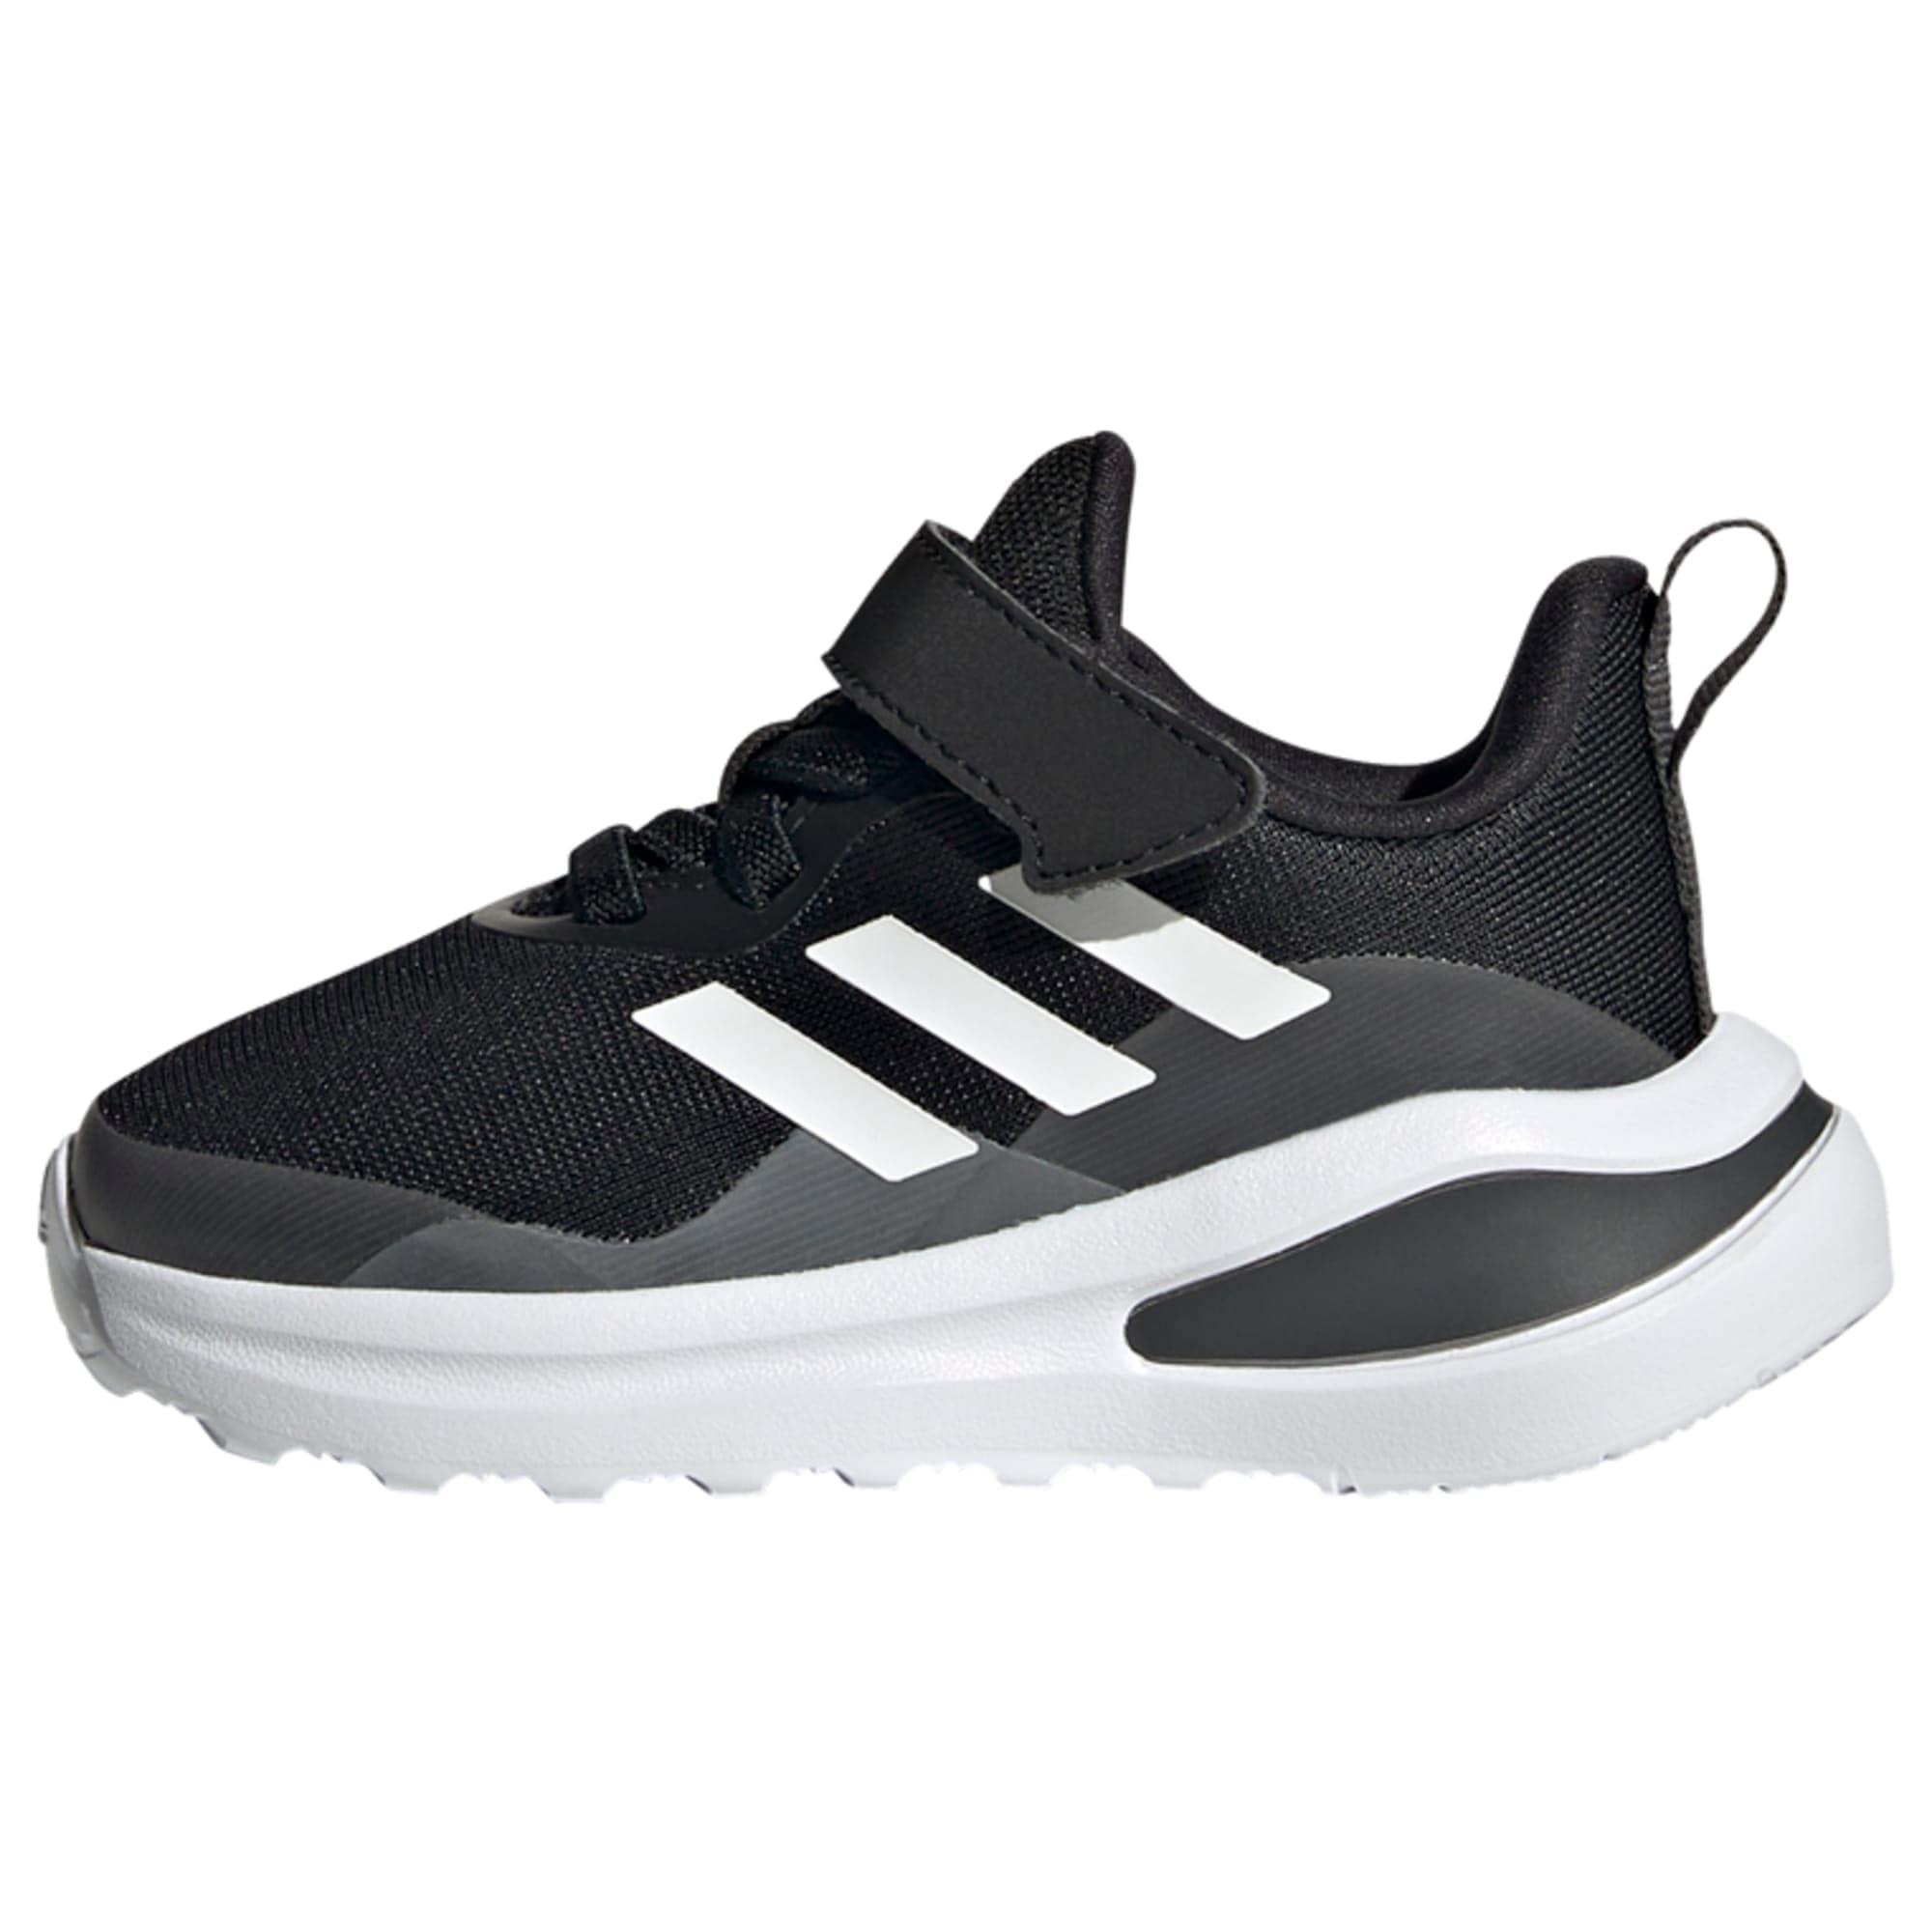 adidas performance scarpa sportiva 'fortarun' nero